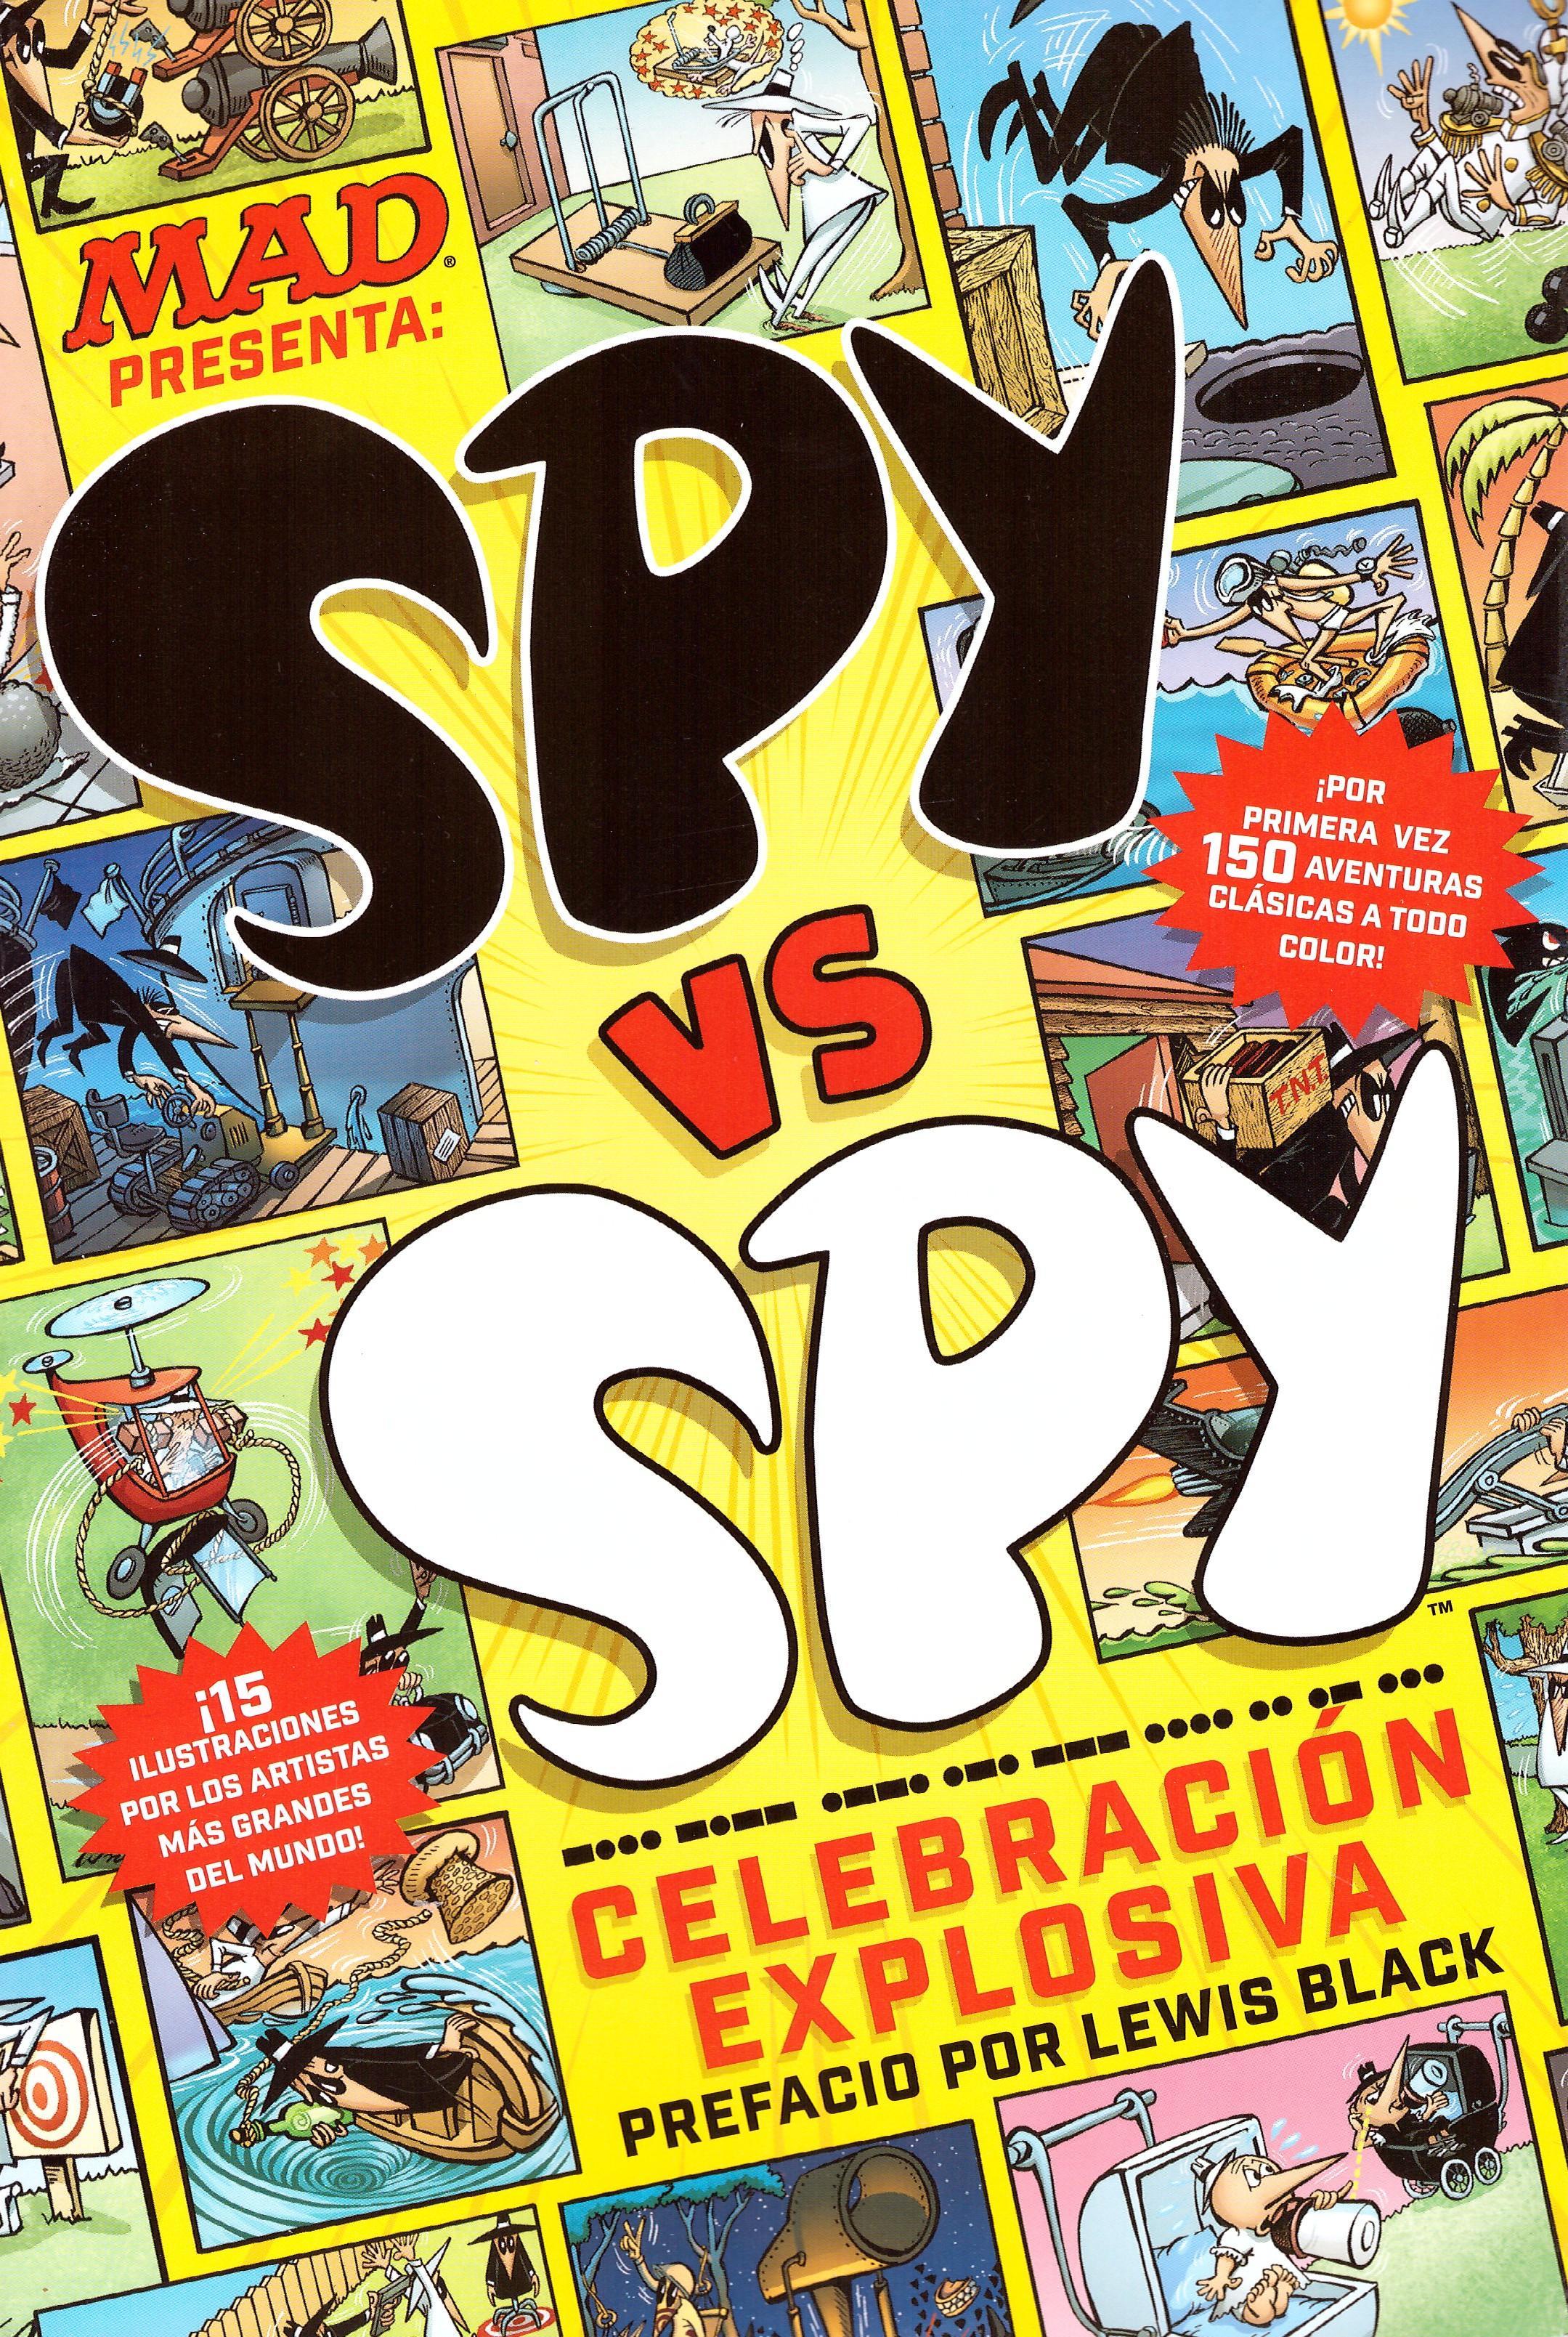 MAD presenta: Spy vs Spy - Celebración Explosiva • Mexico